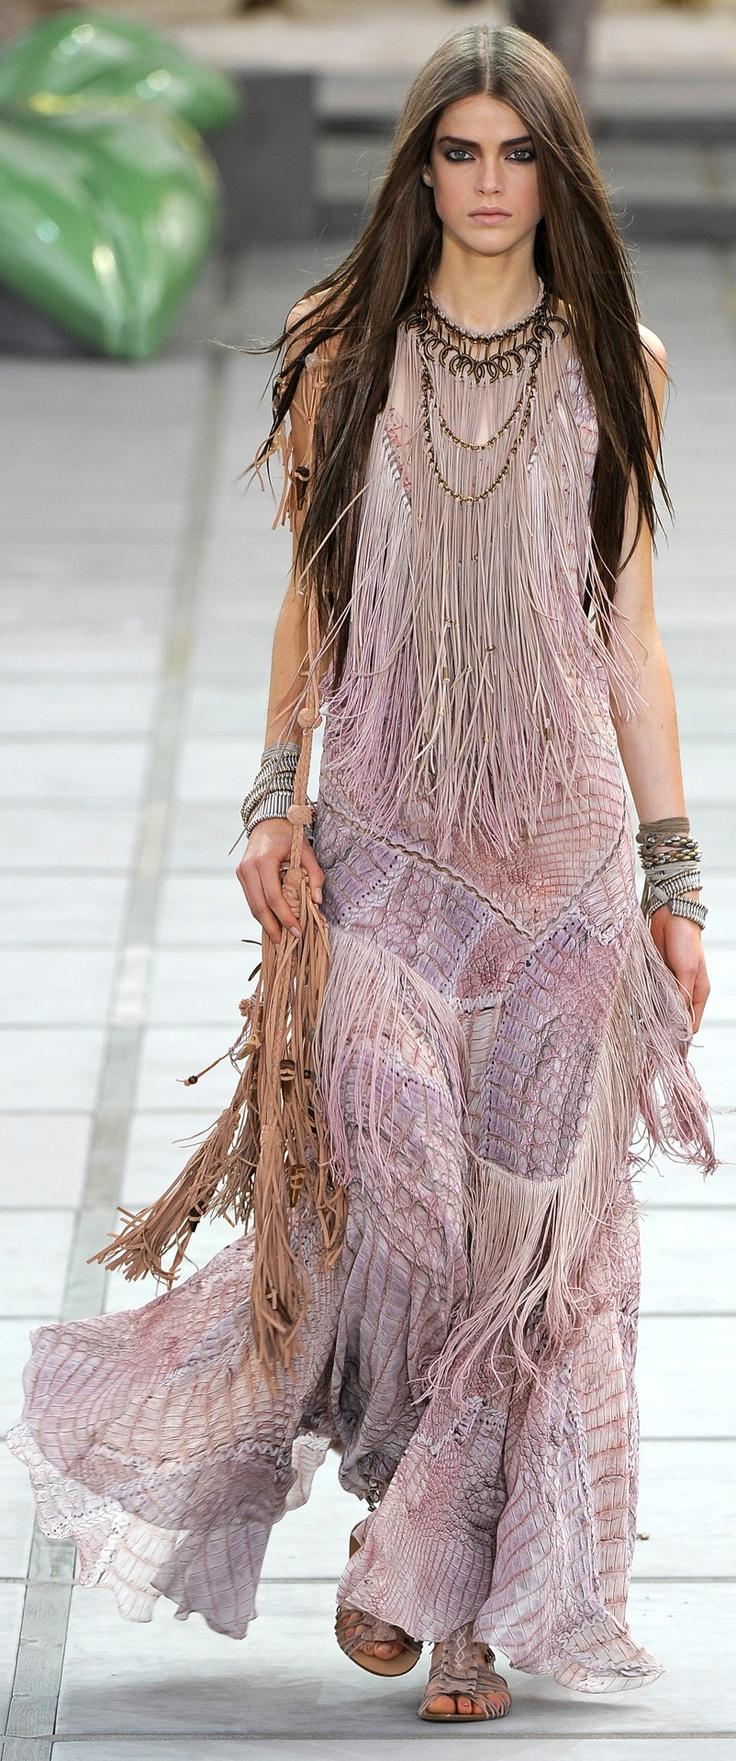 O estilo n made na moda inspire se e conhe a essa for American haute couture